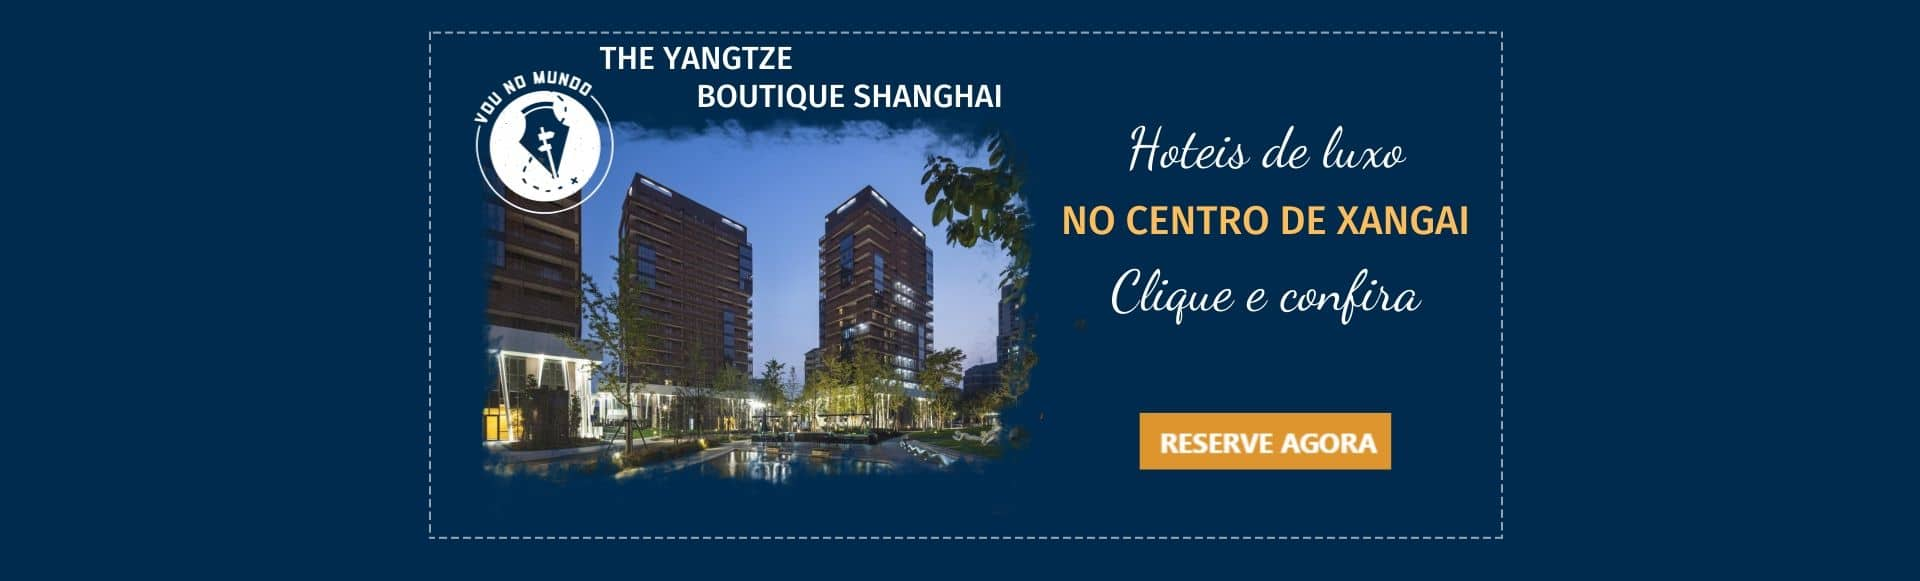 Hotel Yangtze em Xangai, China.